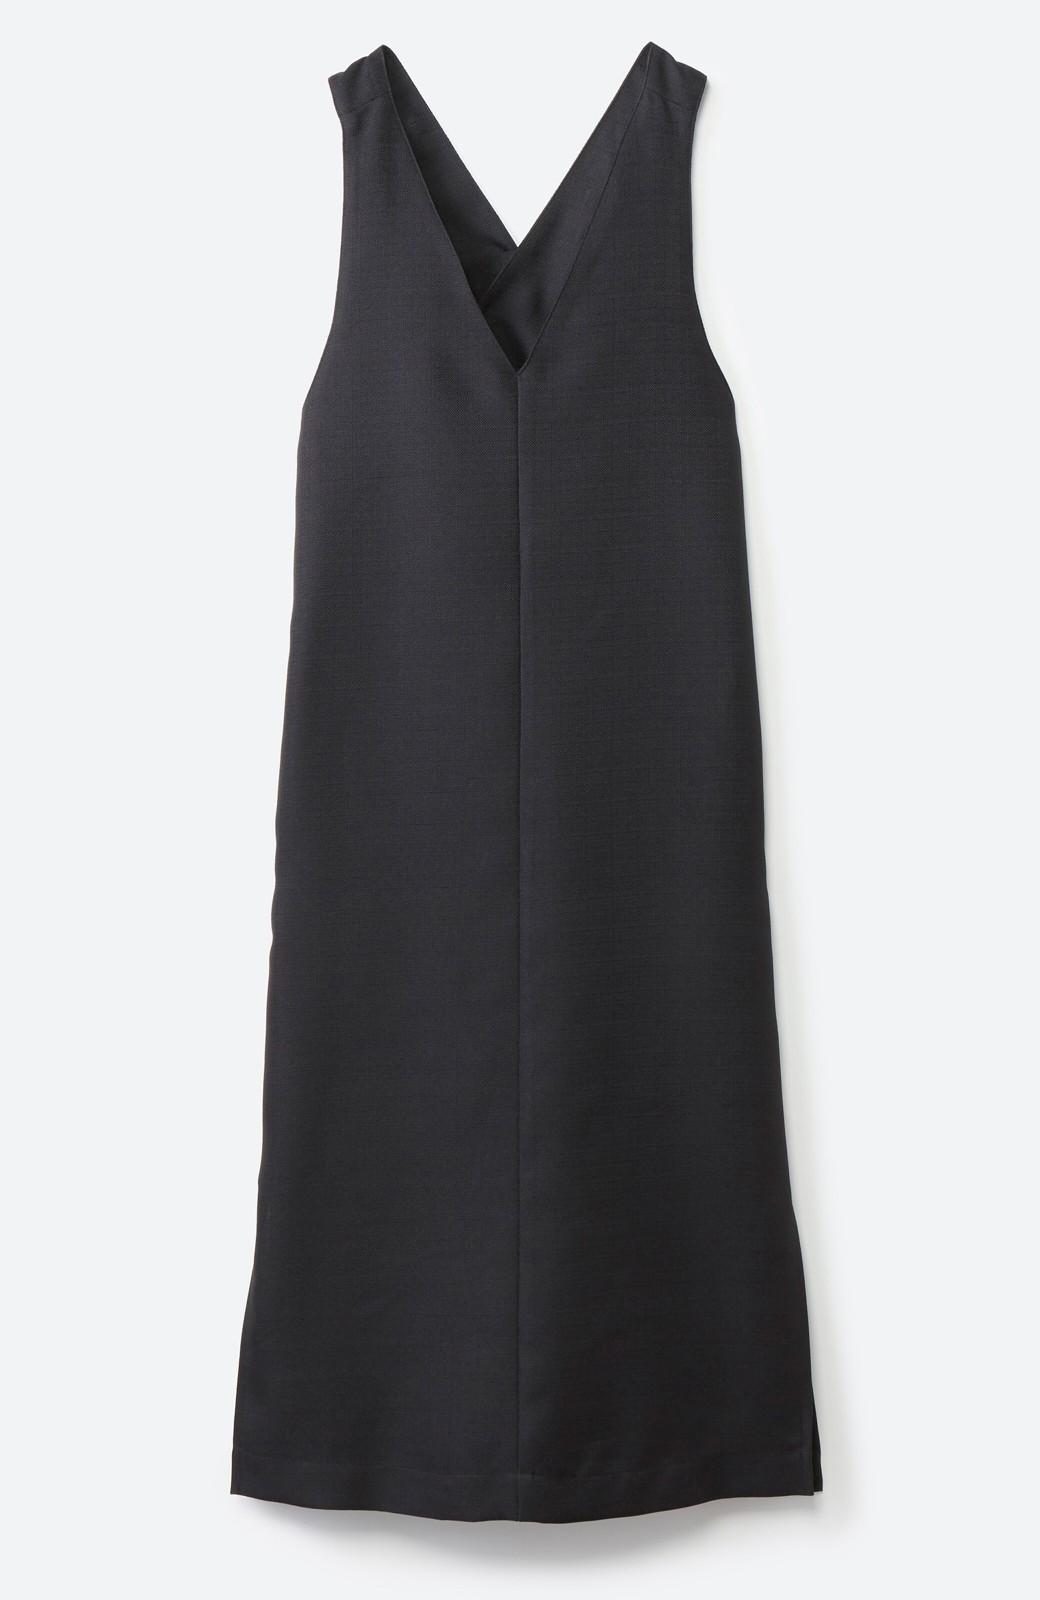 haco! 何てことないTシャツと重ねるだけでパッとかわいくなれる 魔法のようなジャンパースカート <ブラック>の商品写真2